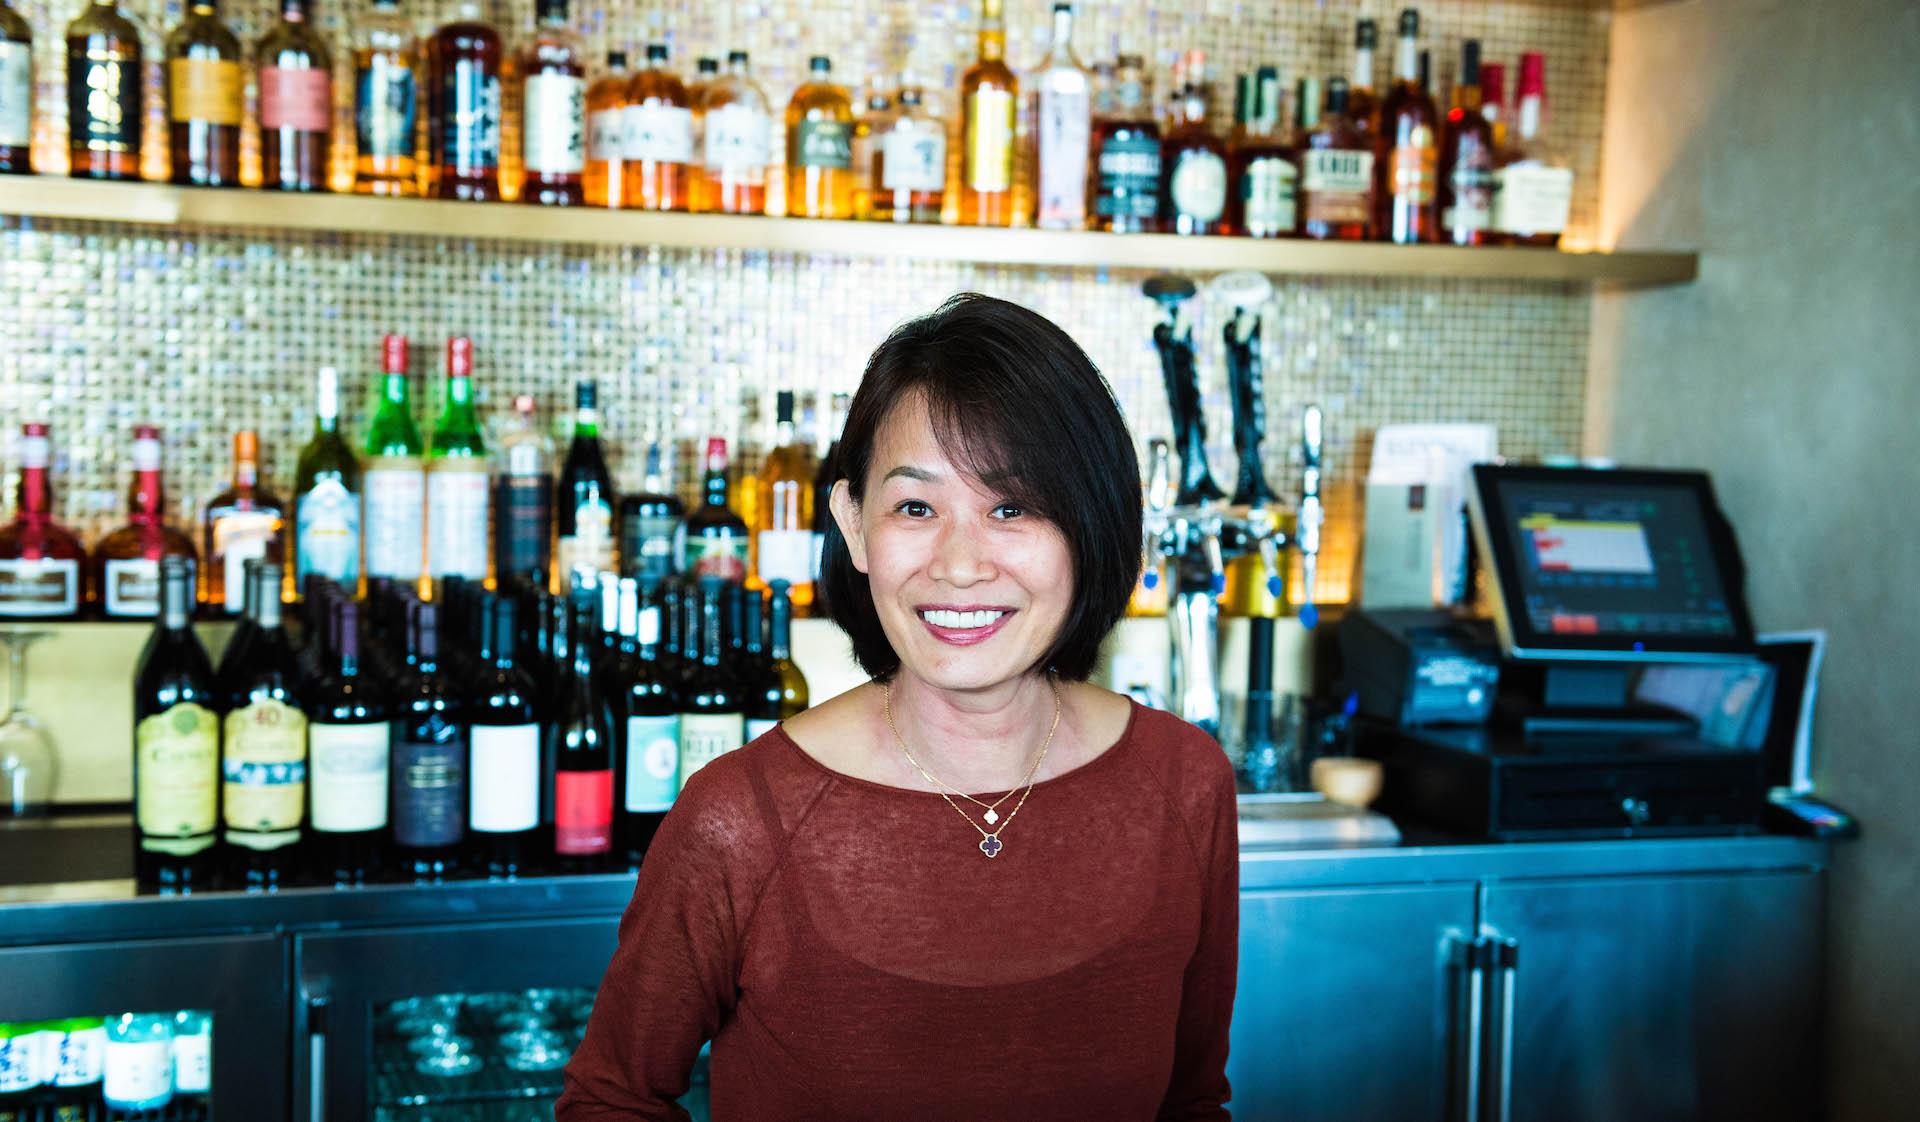 Gigi Cheung, the Vice President of Panda Restaurant Group, at the YakiYan bar.